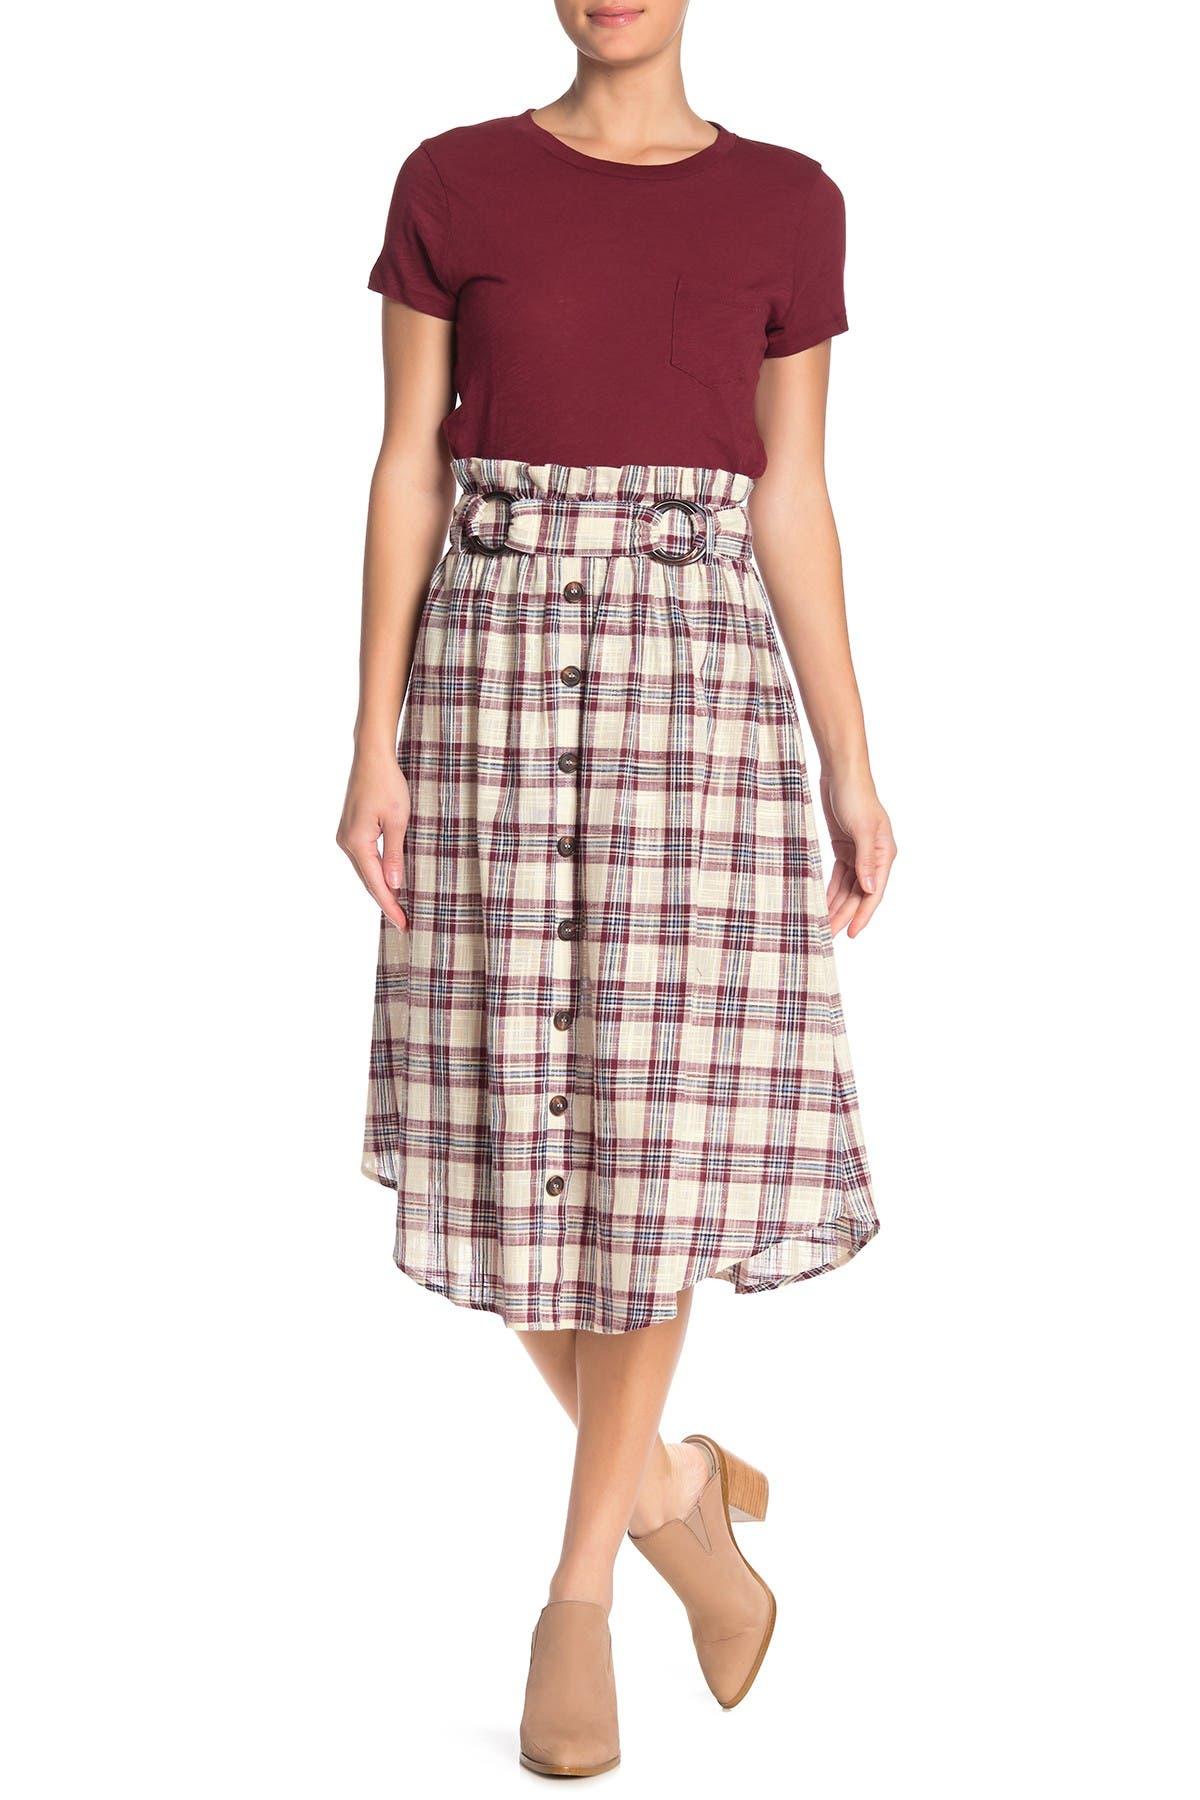 Image of Moon River Double Ring Belt Skirt